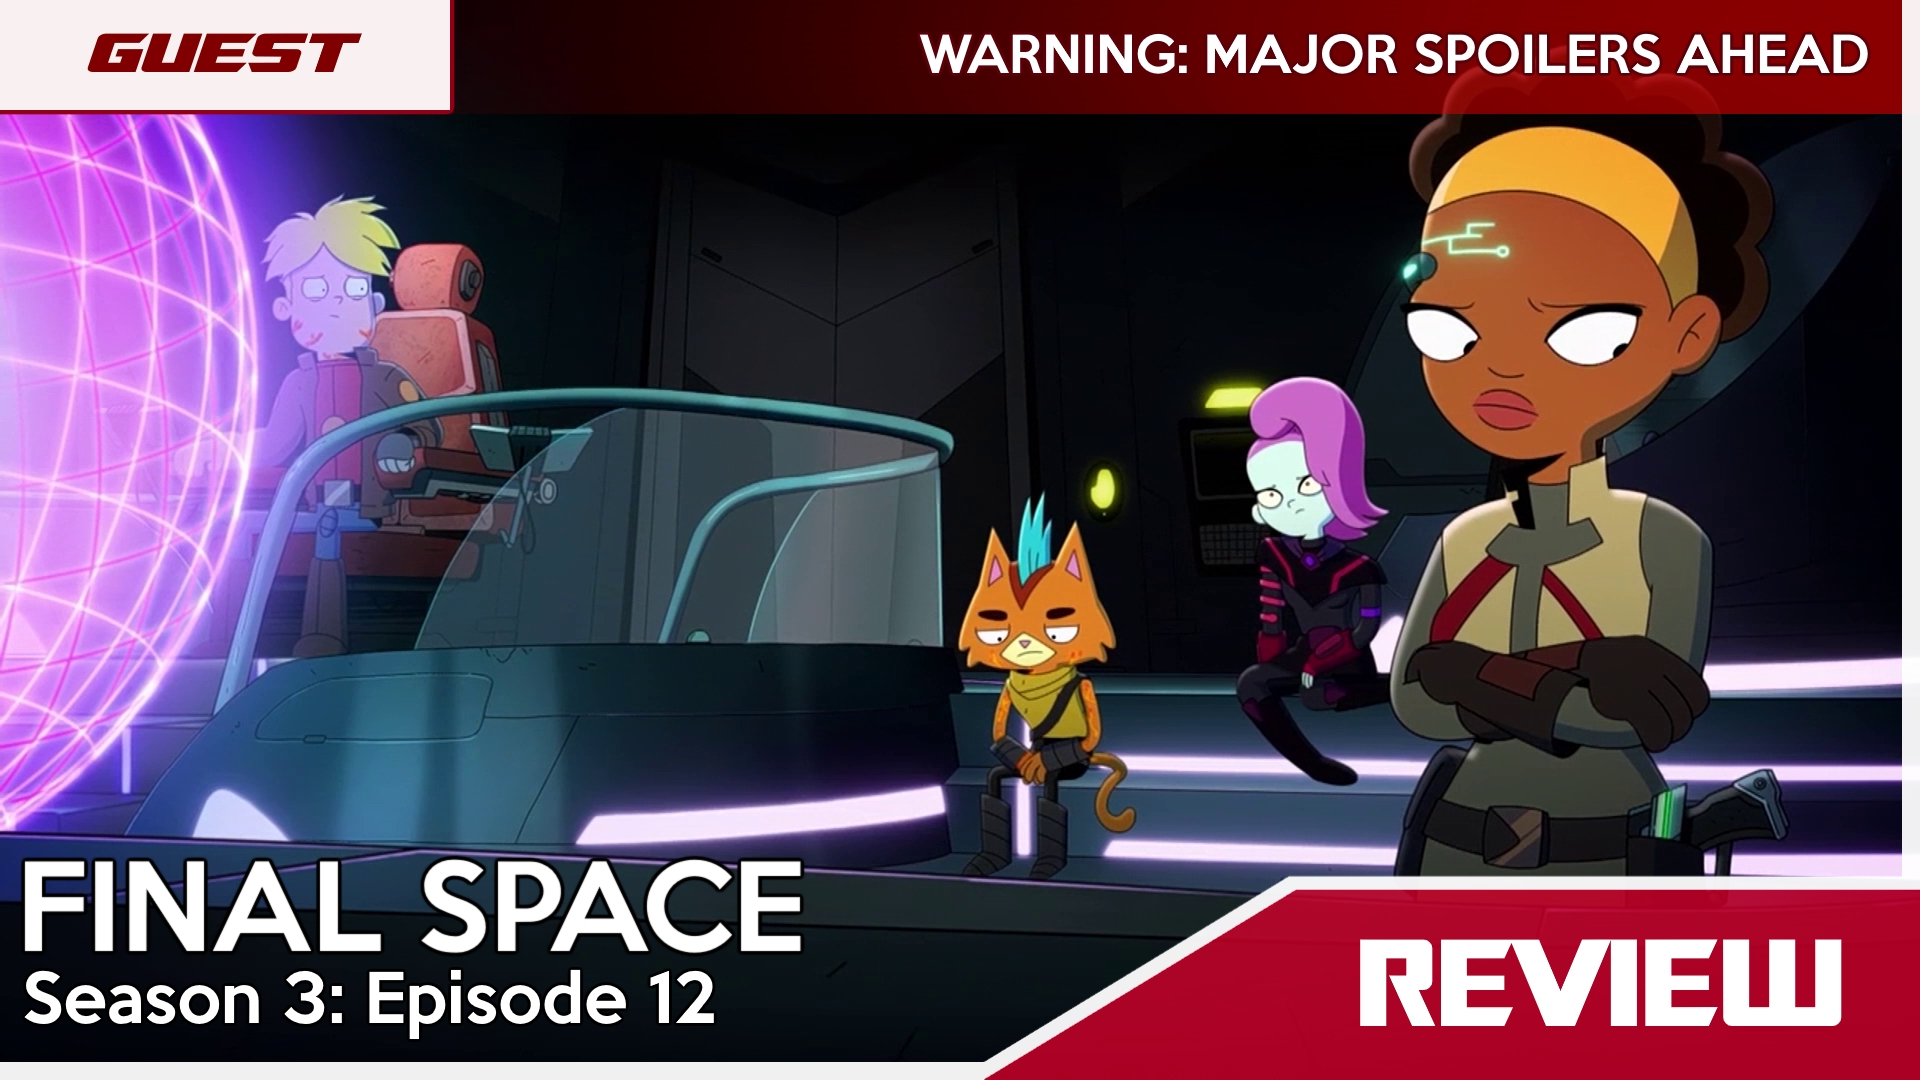 Final Space Season 3 Episode 12 Review